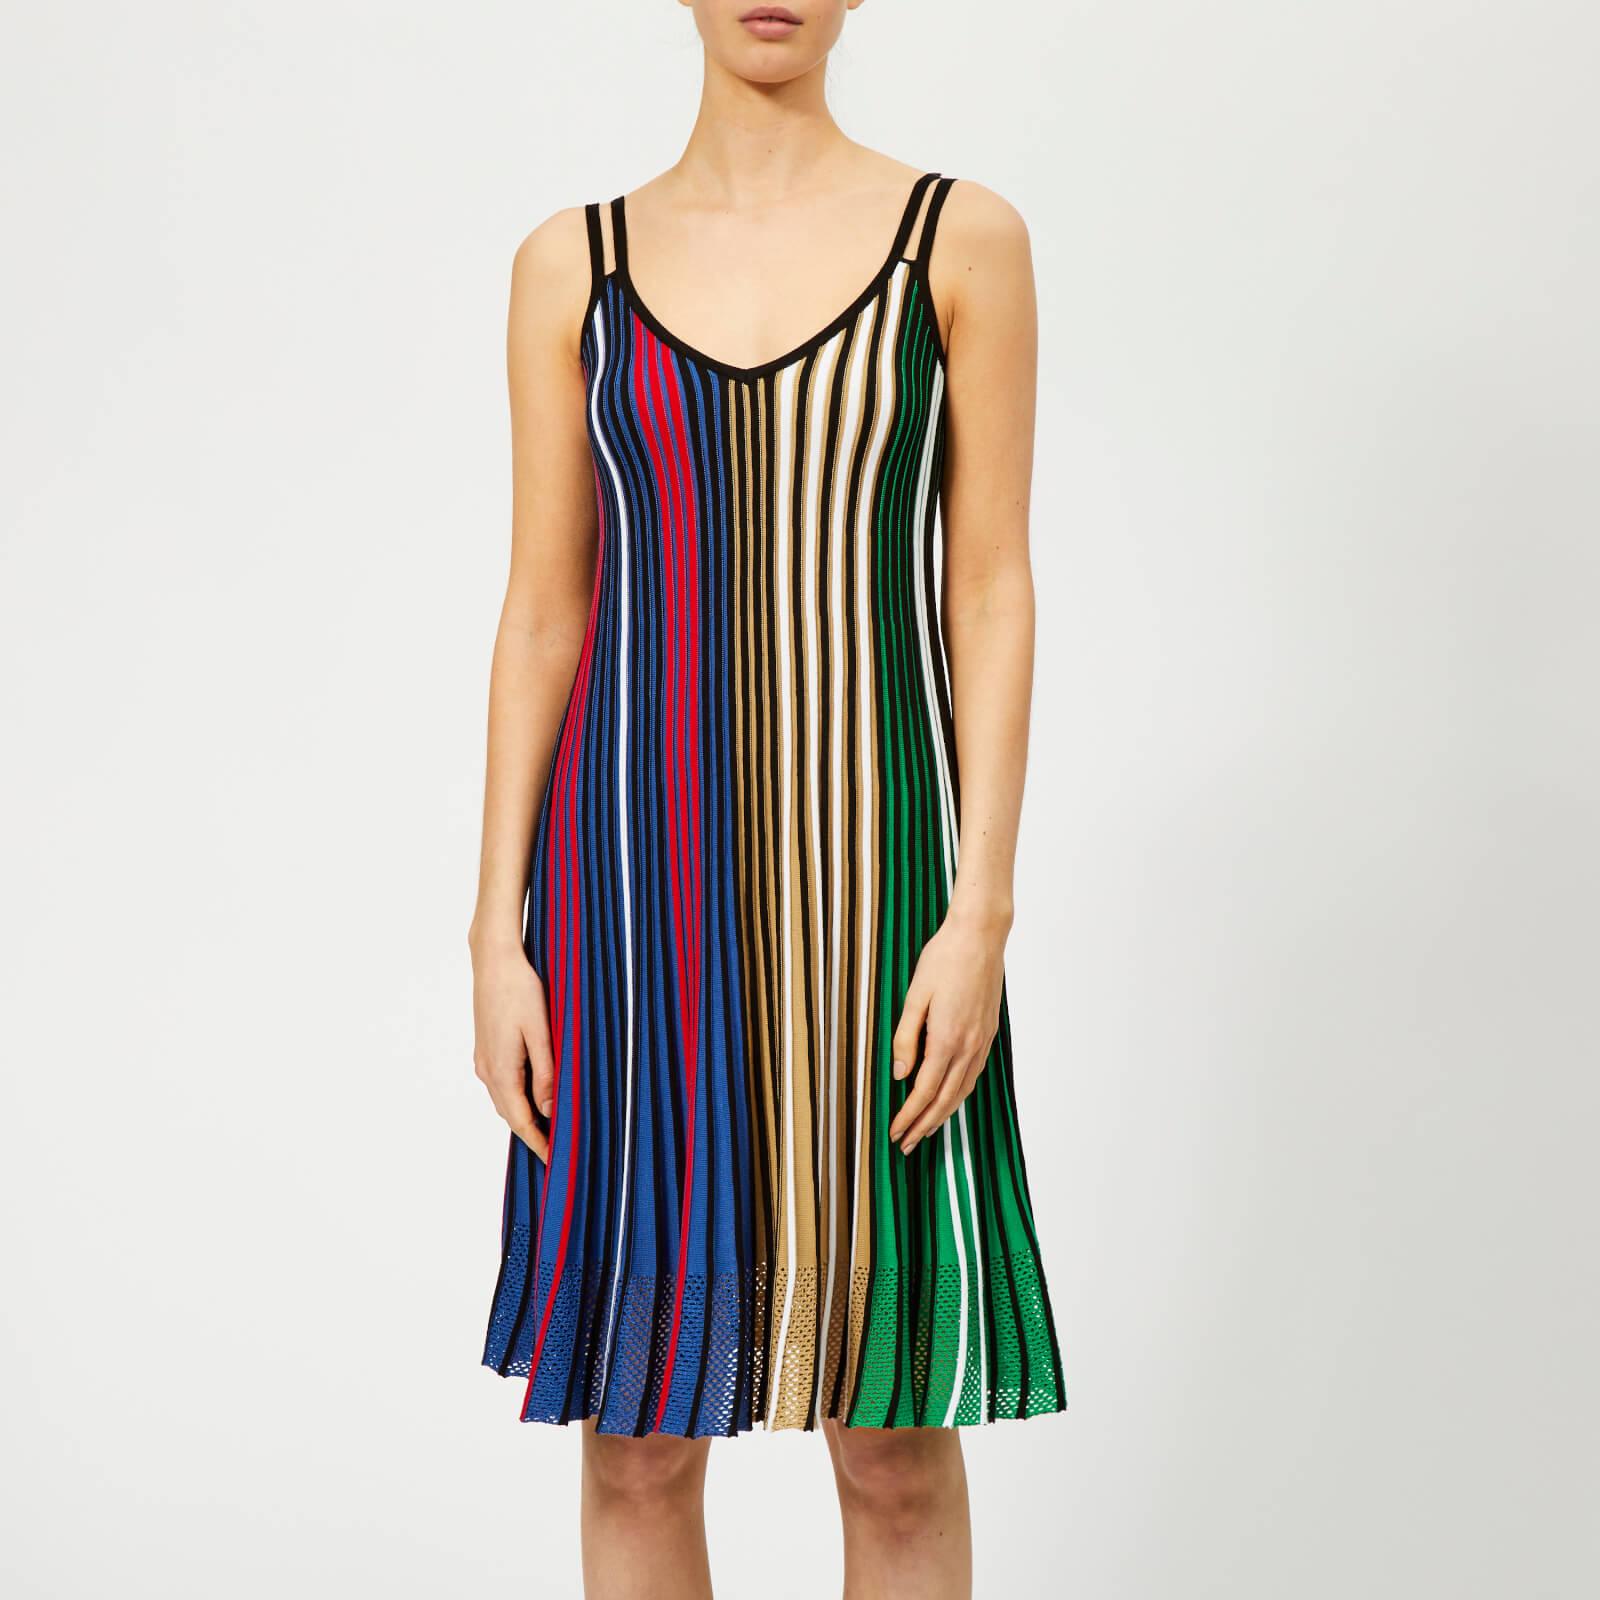 5ac4e3fdb8a31 KENZO Women's Vertical Ribs Sleeveless Dress - Multicolor